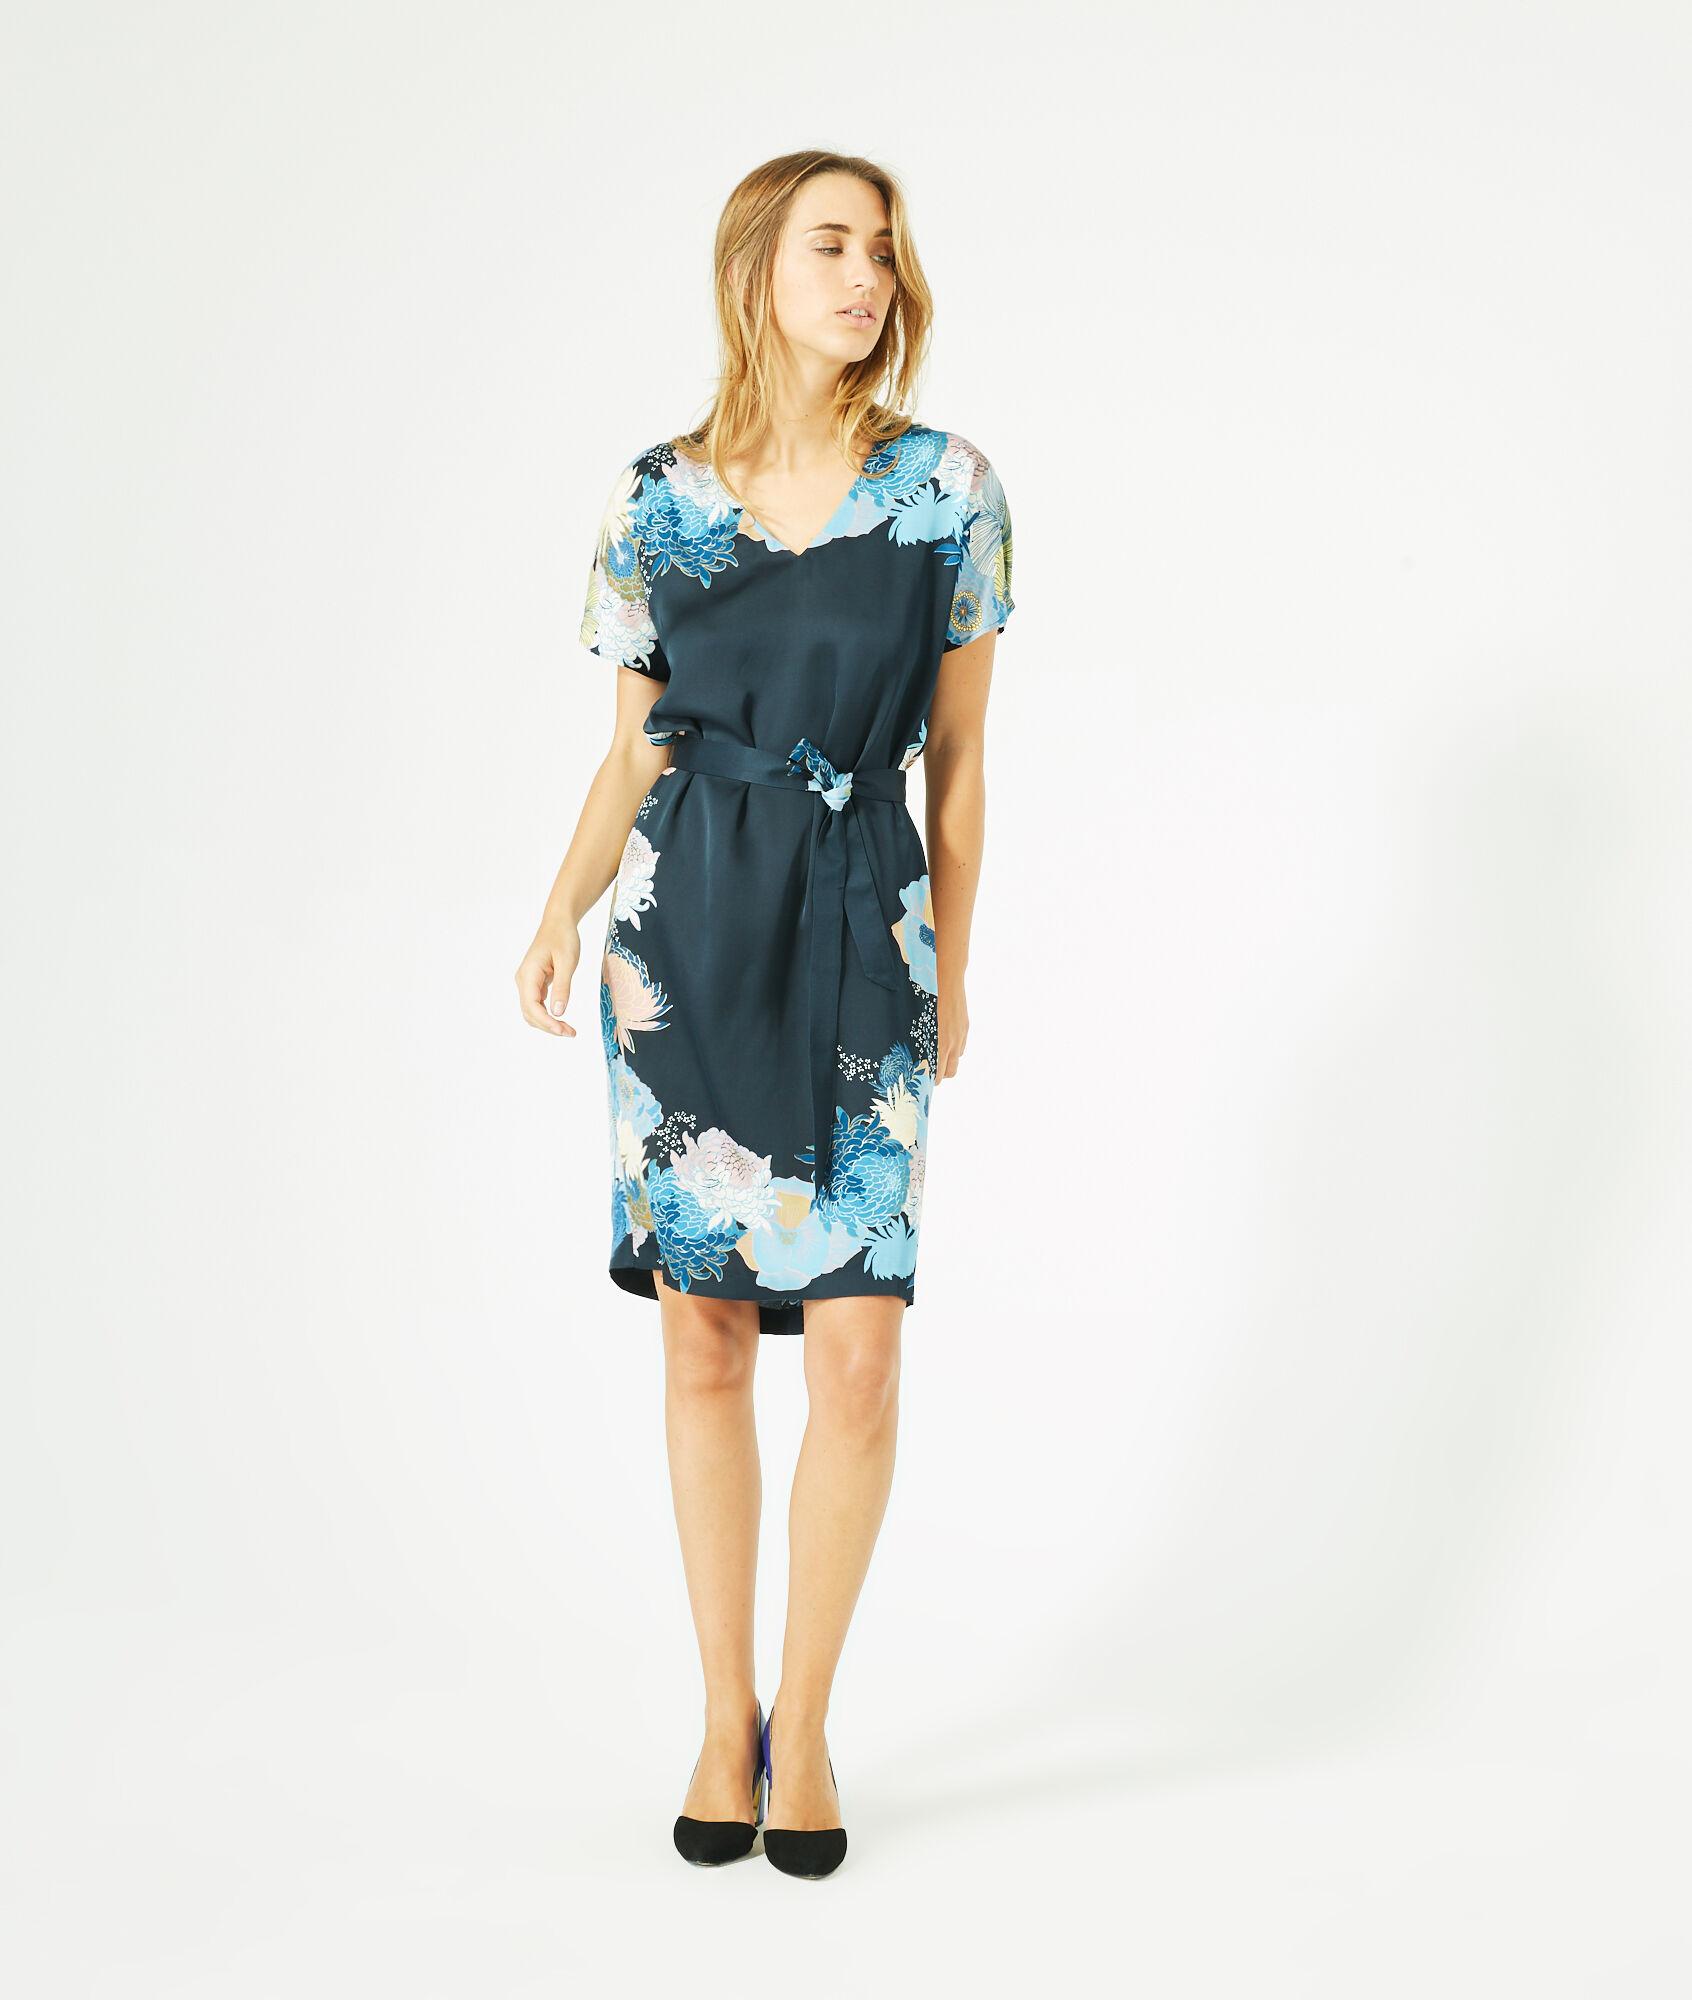 Robe bleu marine 1 2 3